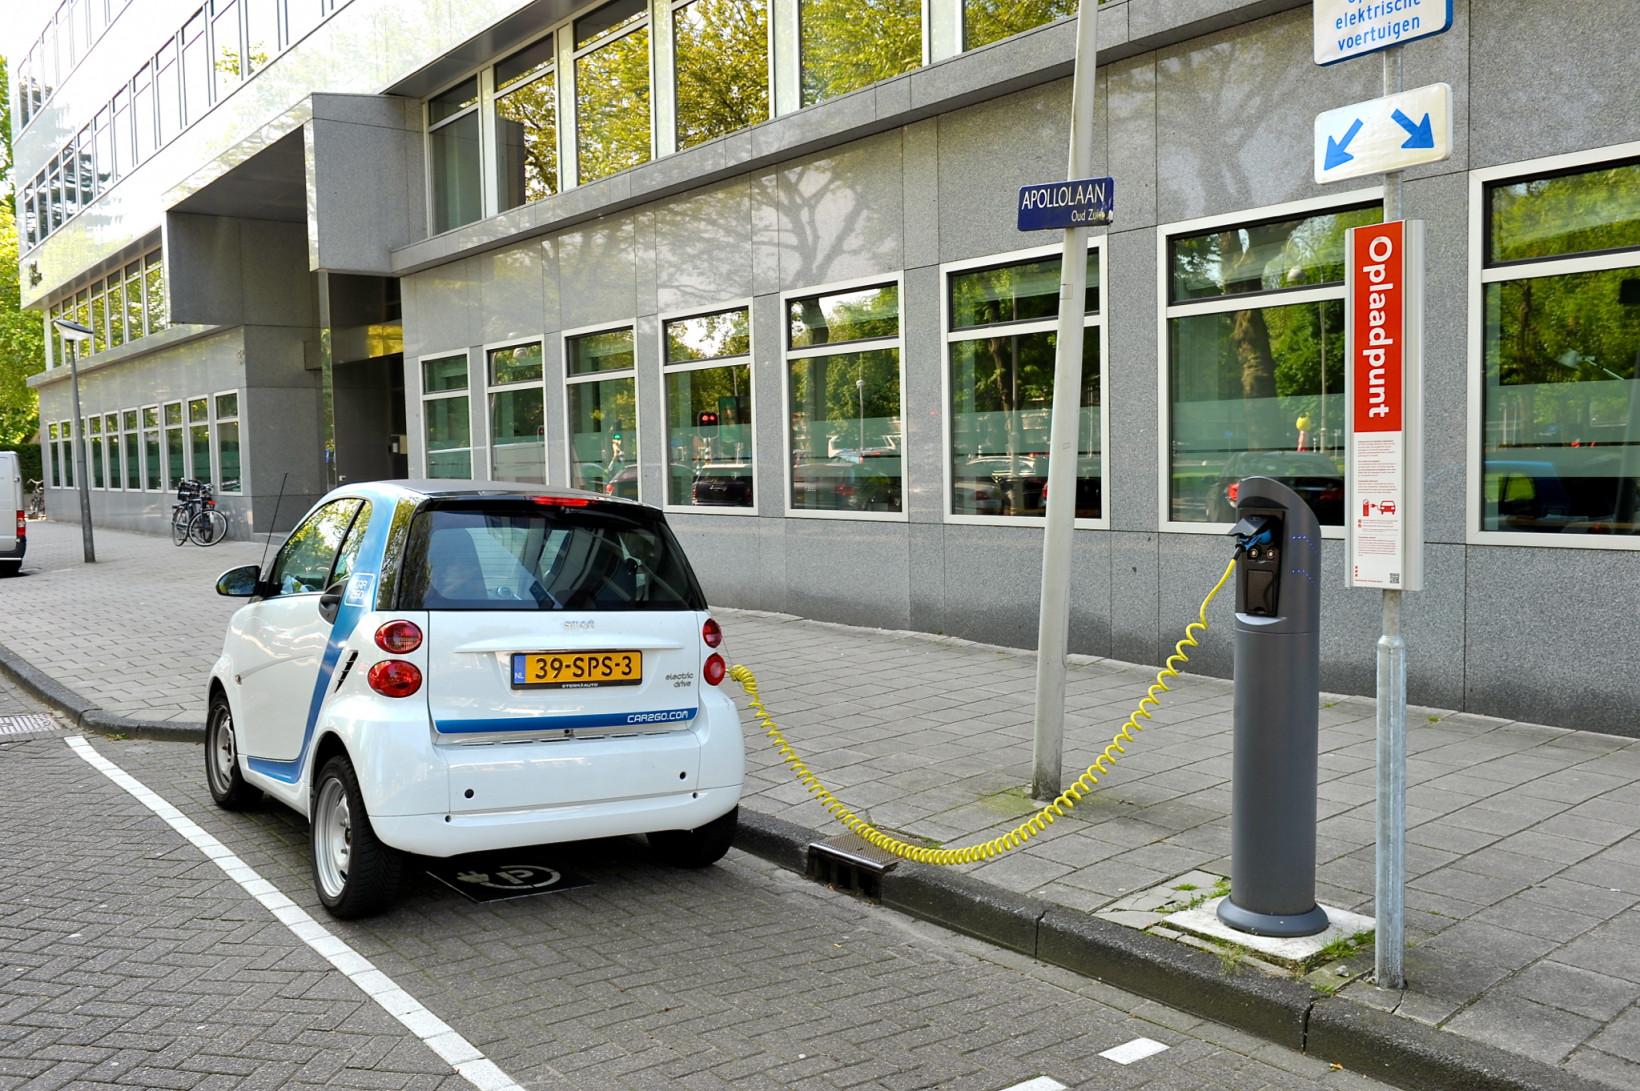 Car2Go EV in the Netherlands طرفداران EV فقط 8 روز کمک هزینه وسیله نقلیه برقی دولت هلندی را 10 میلیون یورو کاهش می دهند